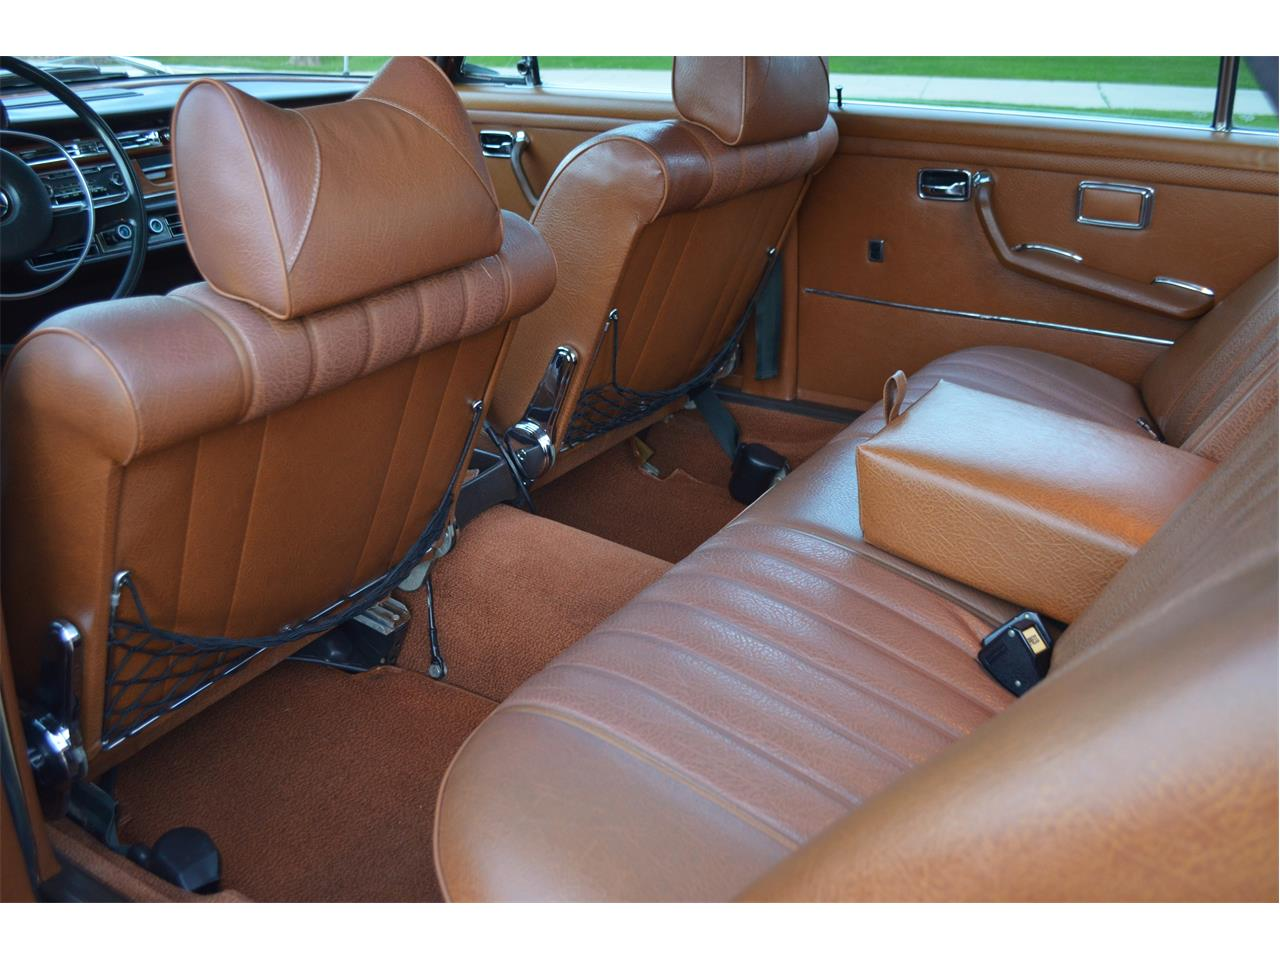 Large Picture of '73 Mercedes-Benz 280SEL - $23,995.00 - PNR0